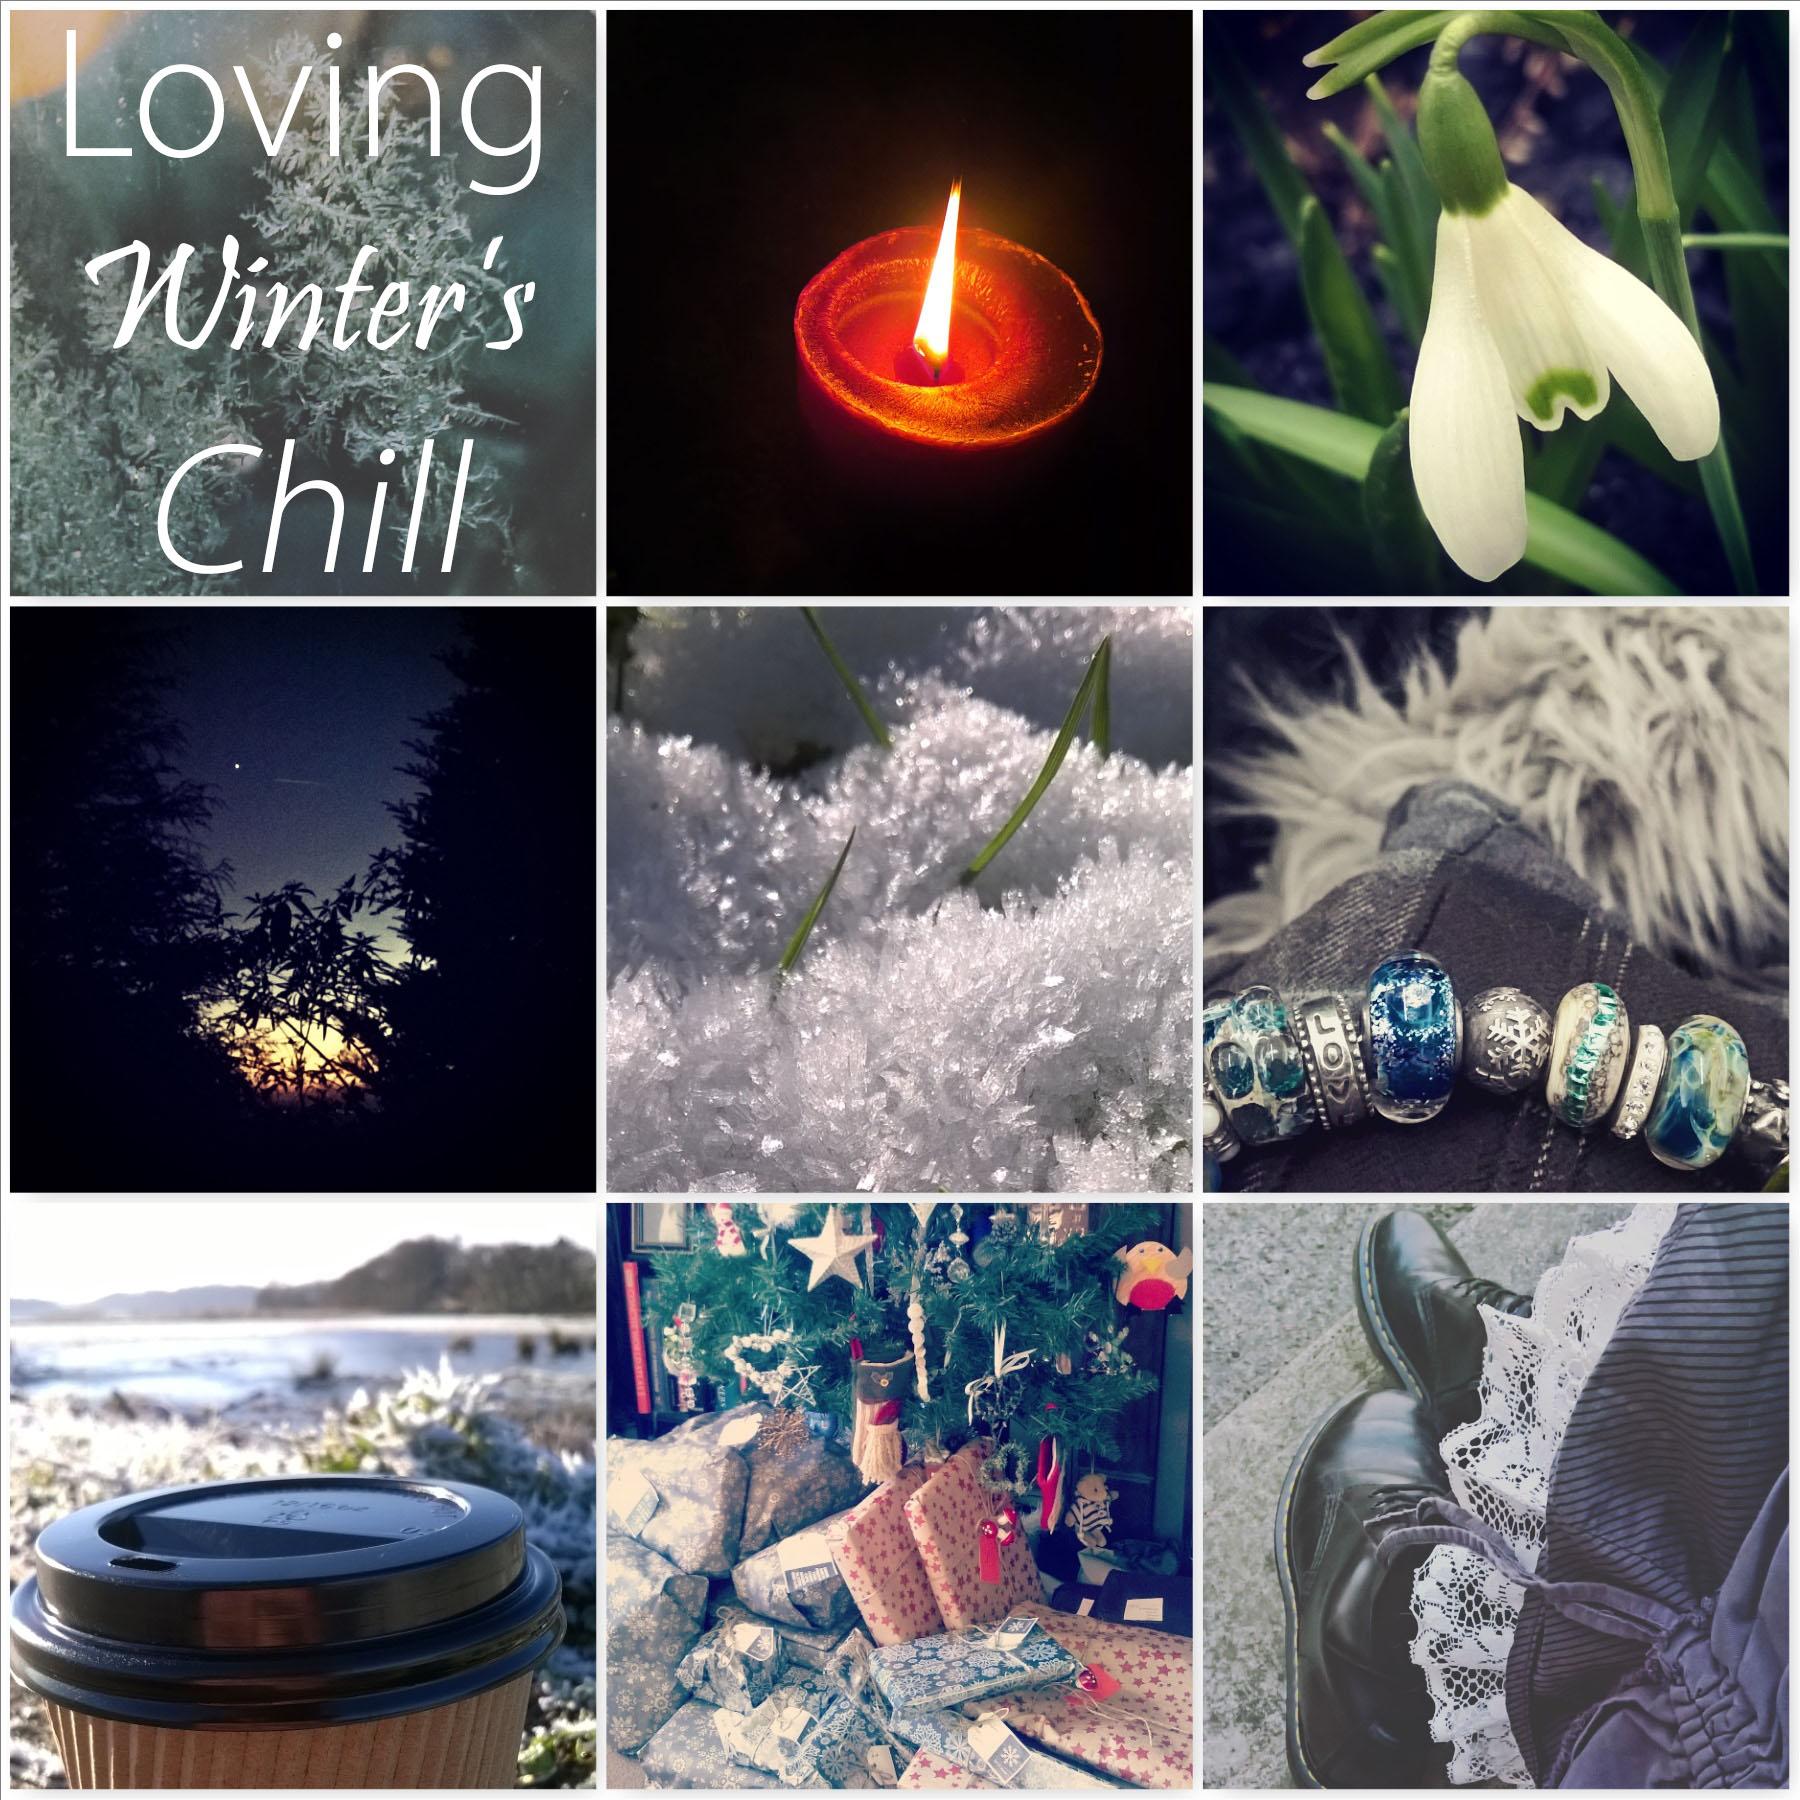 loving-winters-chill-the-best-bits-of-winter-the-last-krystallos